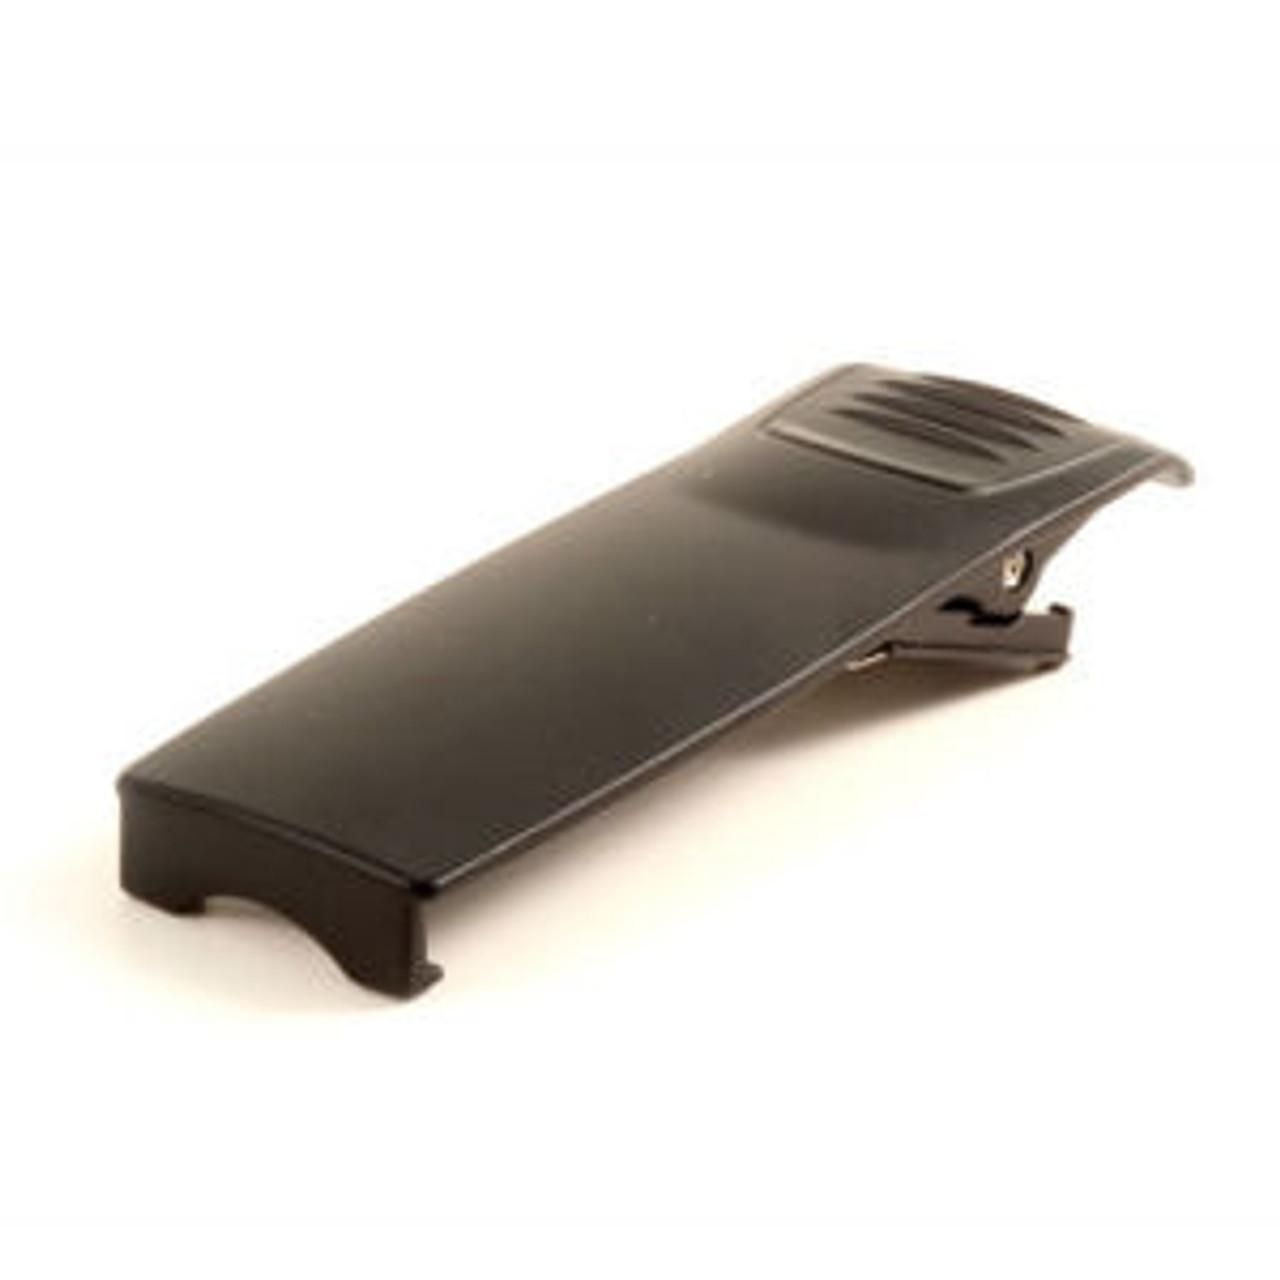 M/A-Com P7170 Metal, Spring Loaded Belt Clip